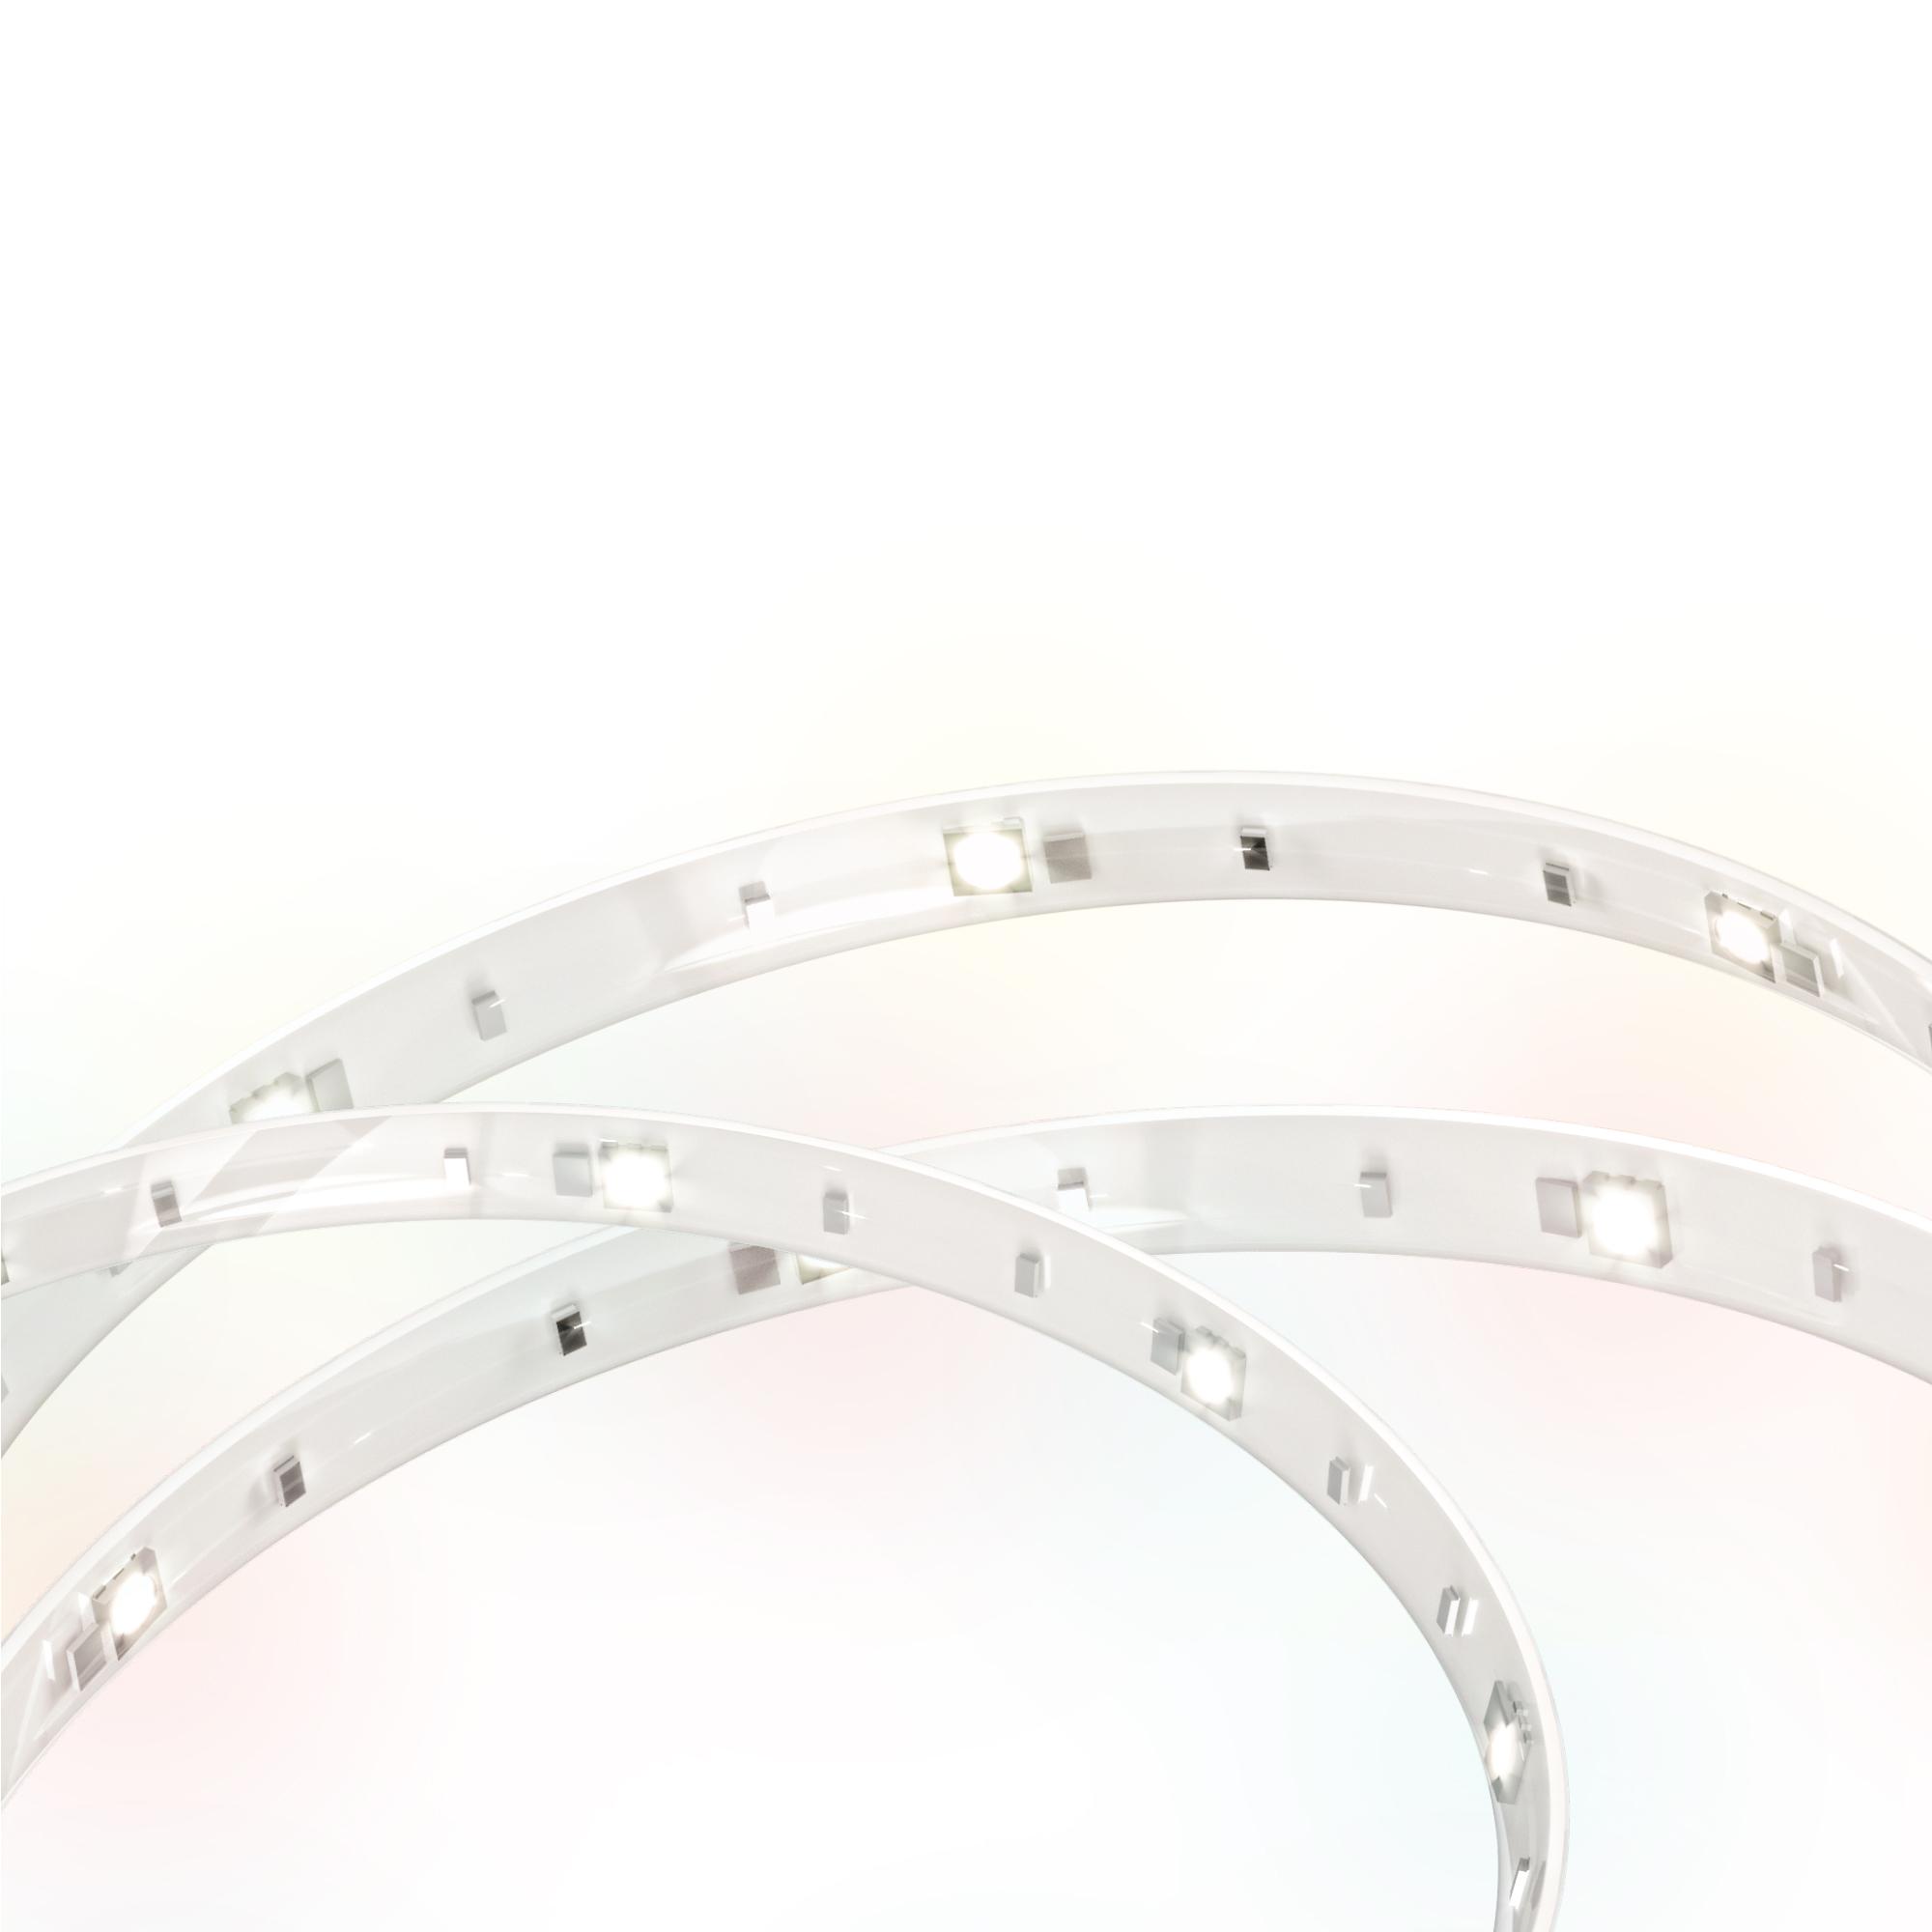 RGBW WIFI Tape Kits - Smart accent lighting